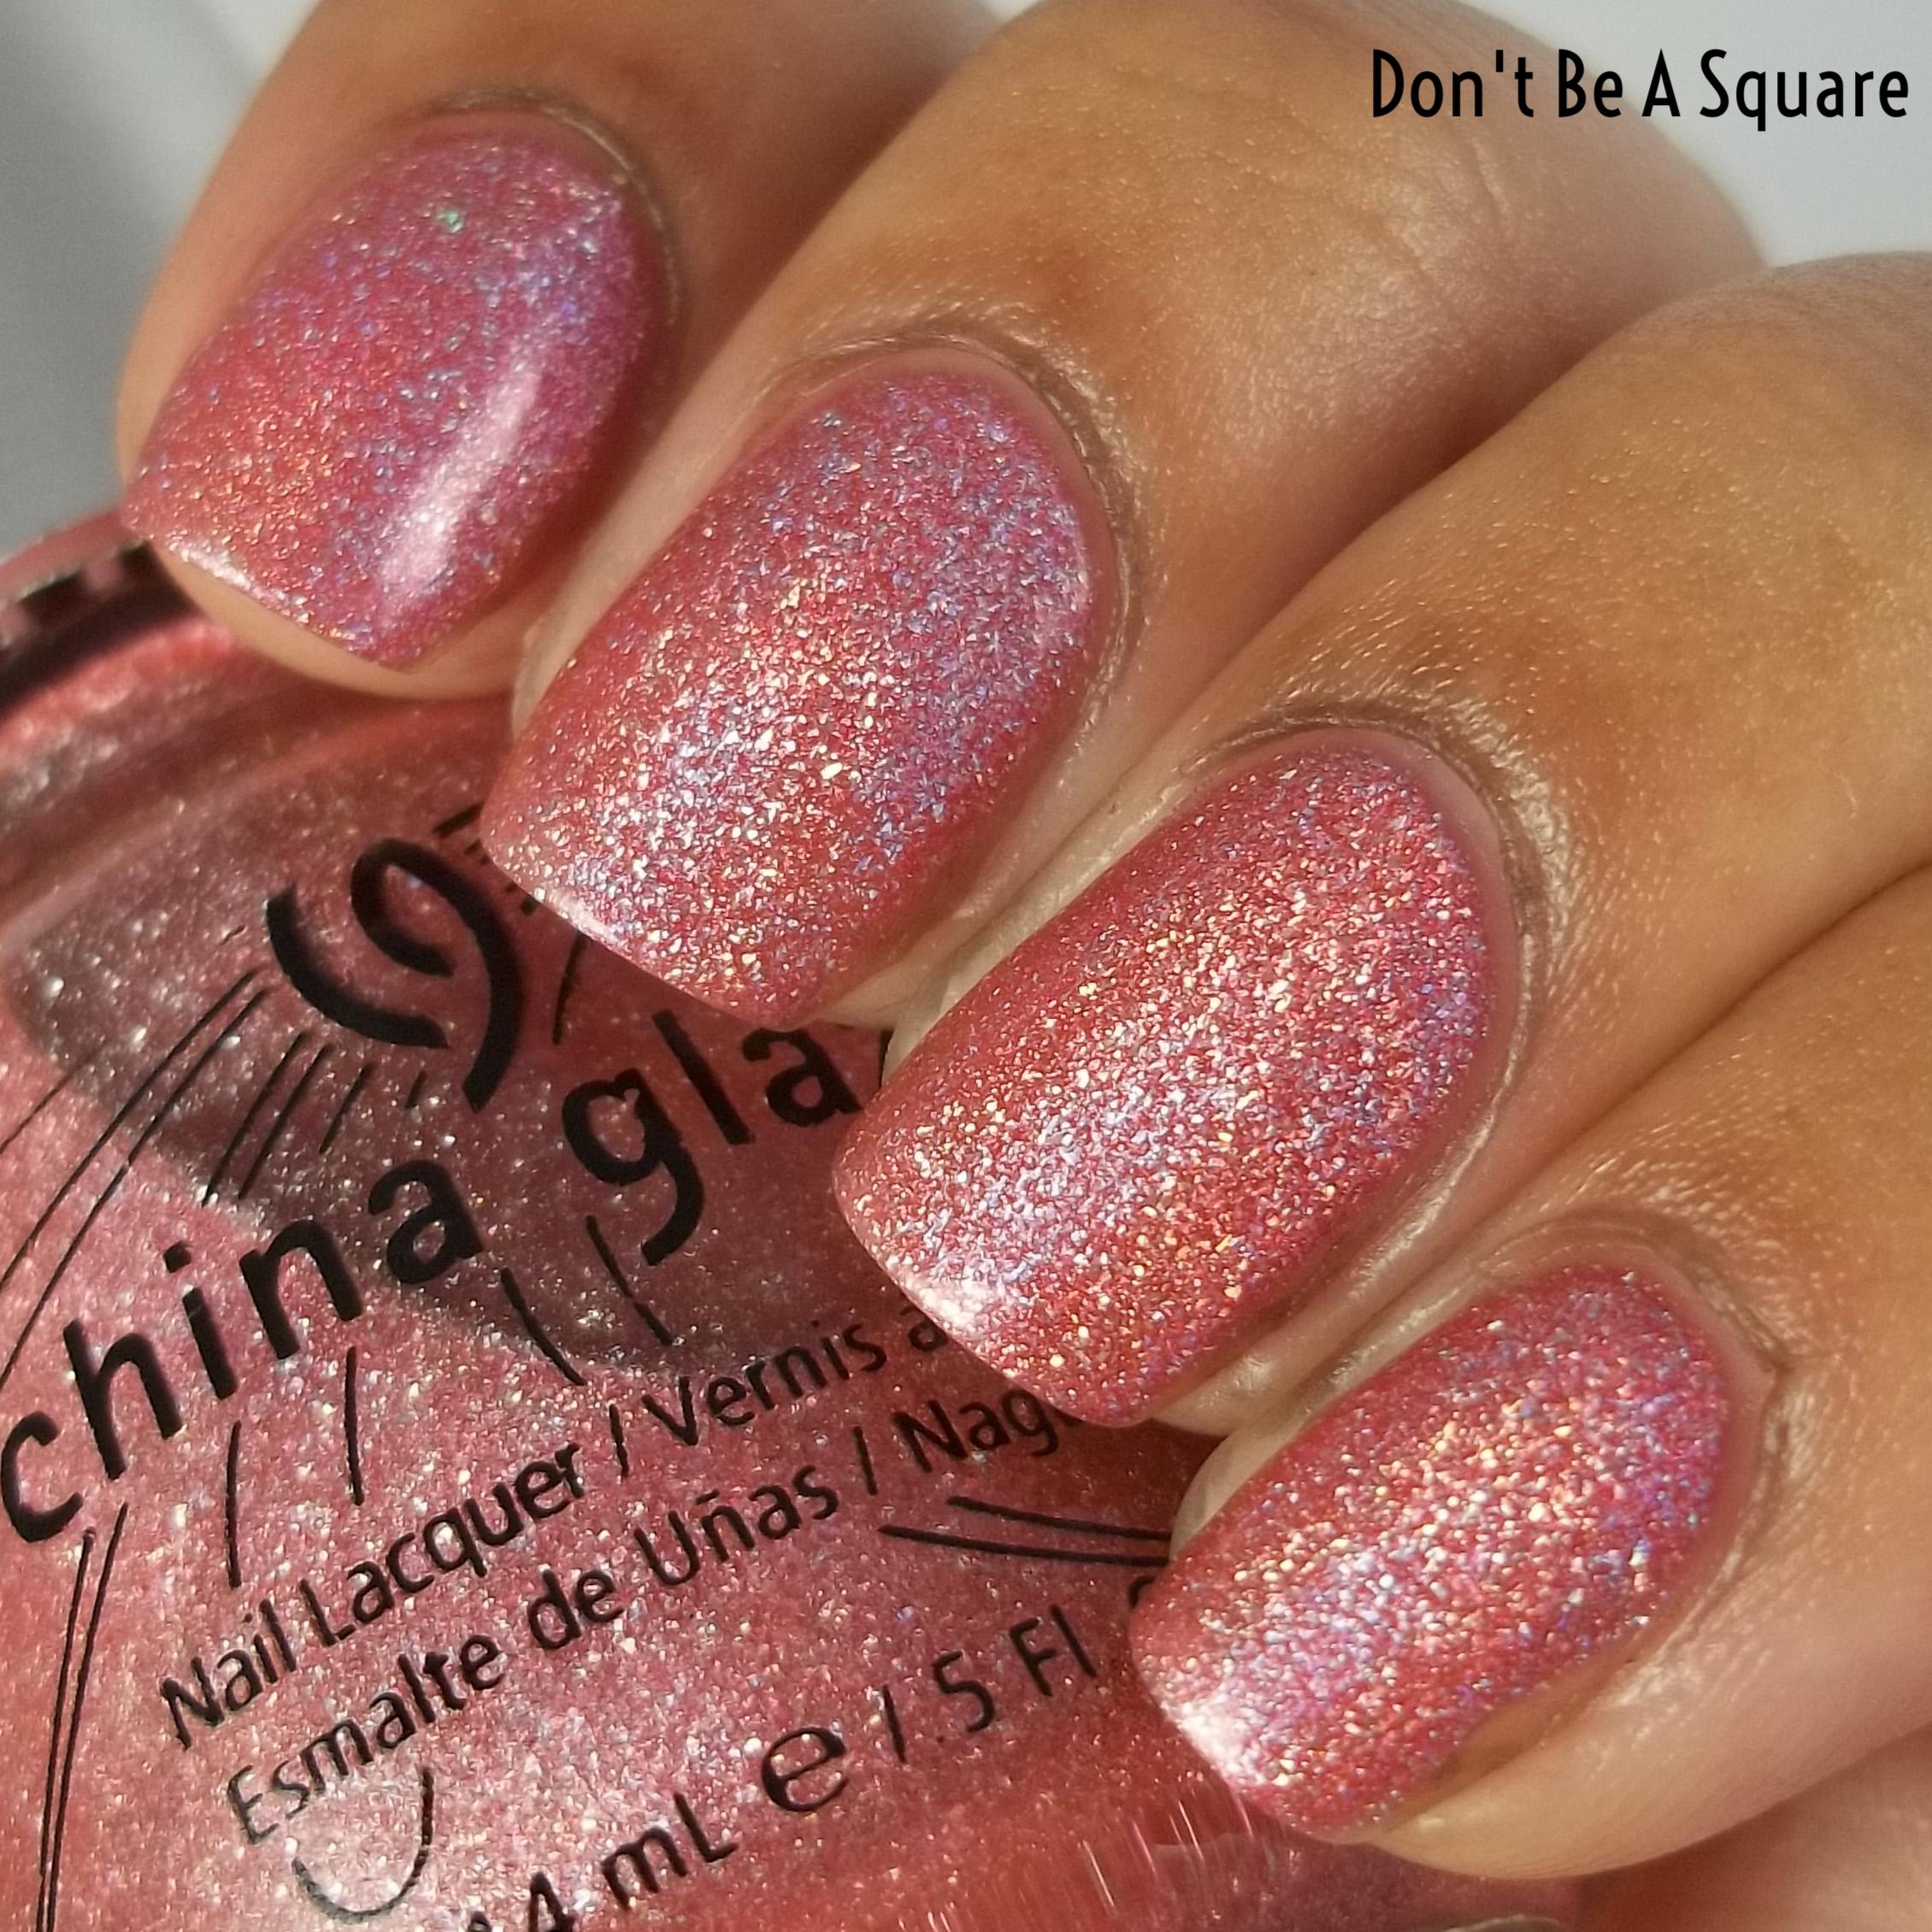 China Glaze Kaleidoscope - Don't Be A Square.jpg